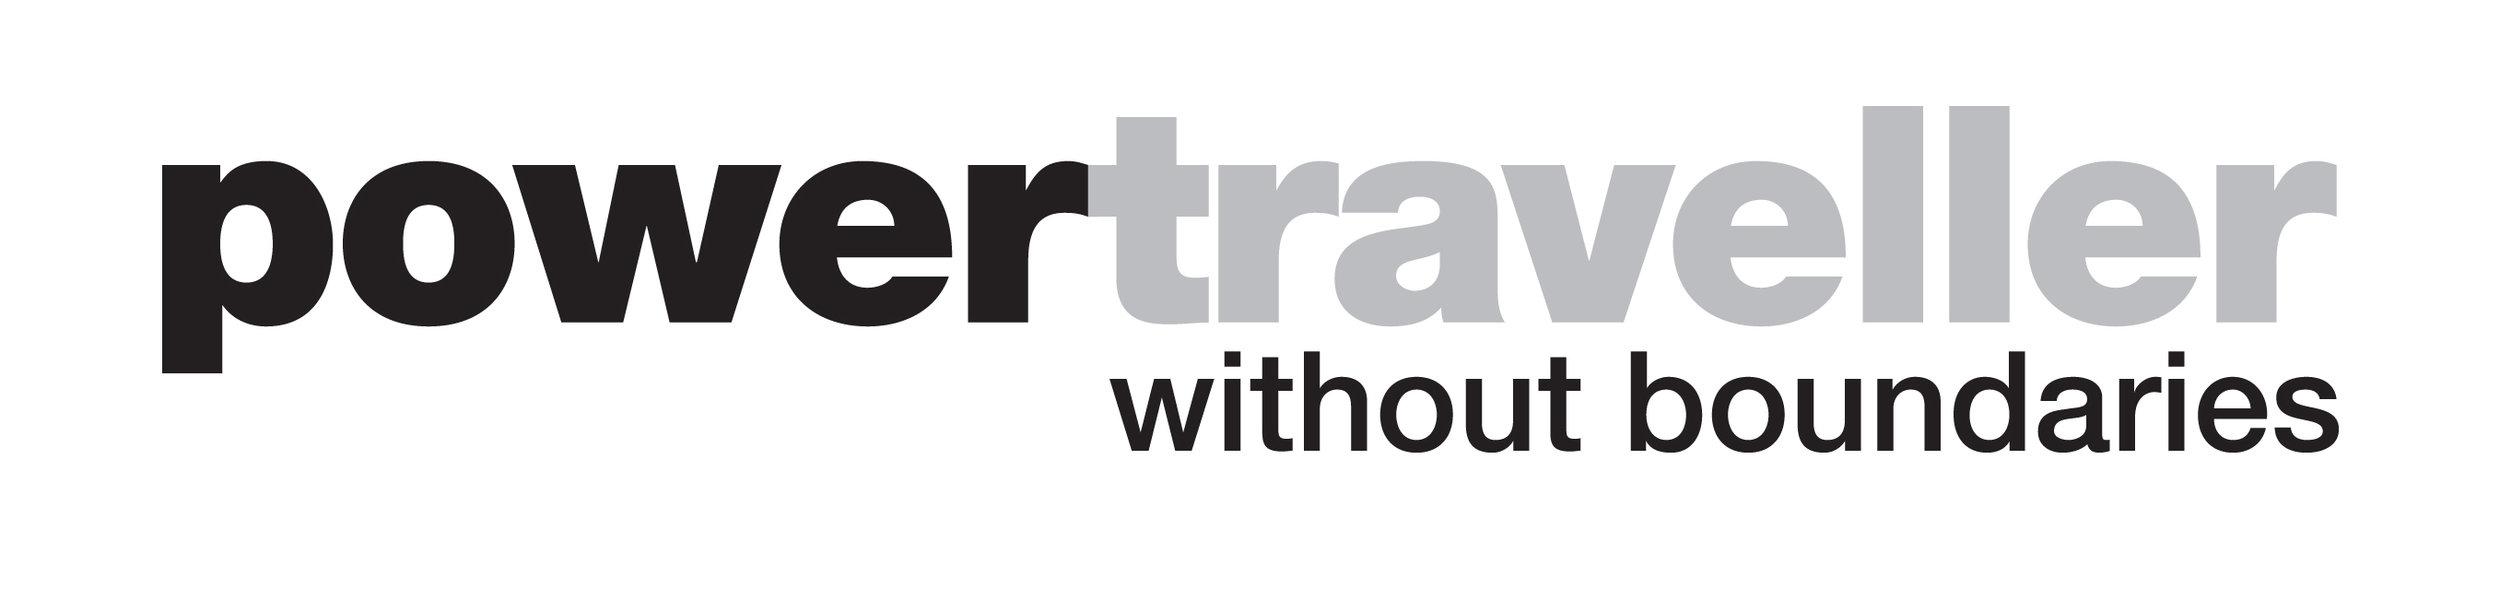 Powertraveller.jpg